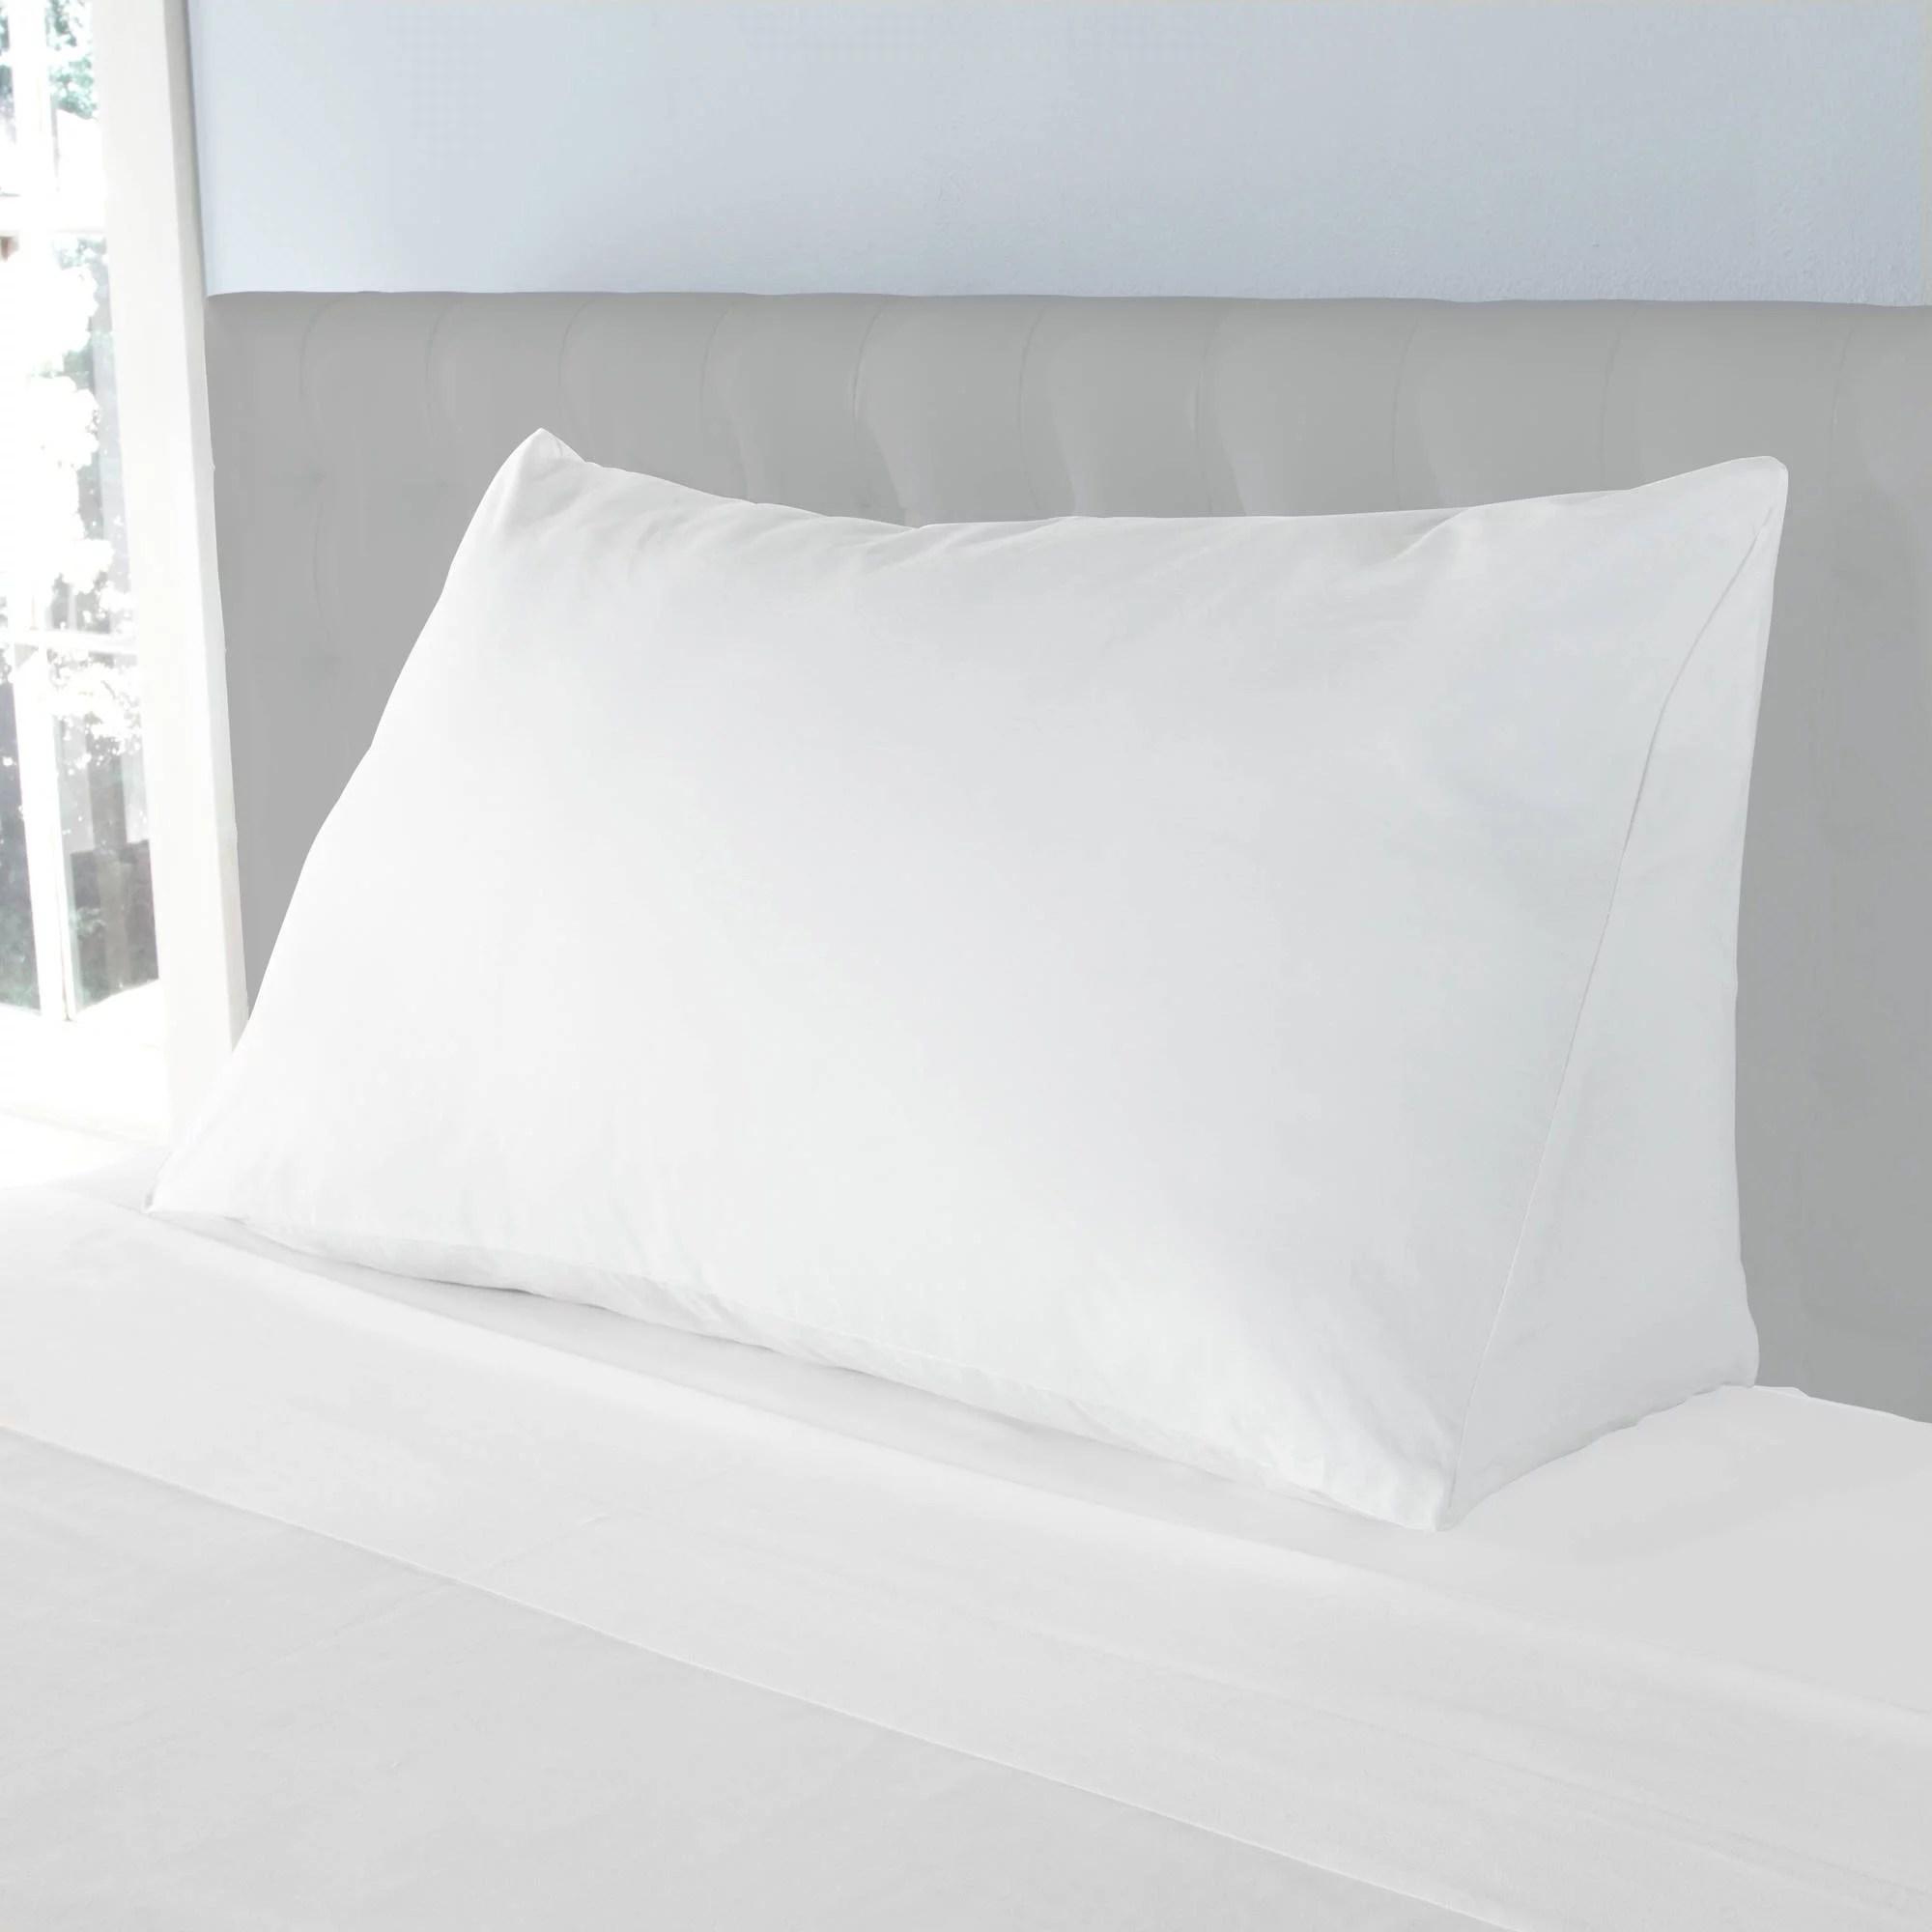 reading wedge triangle pillow bonus acid reflux help